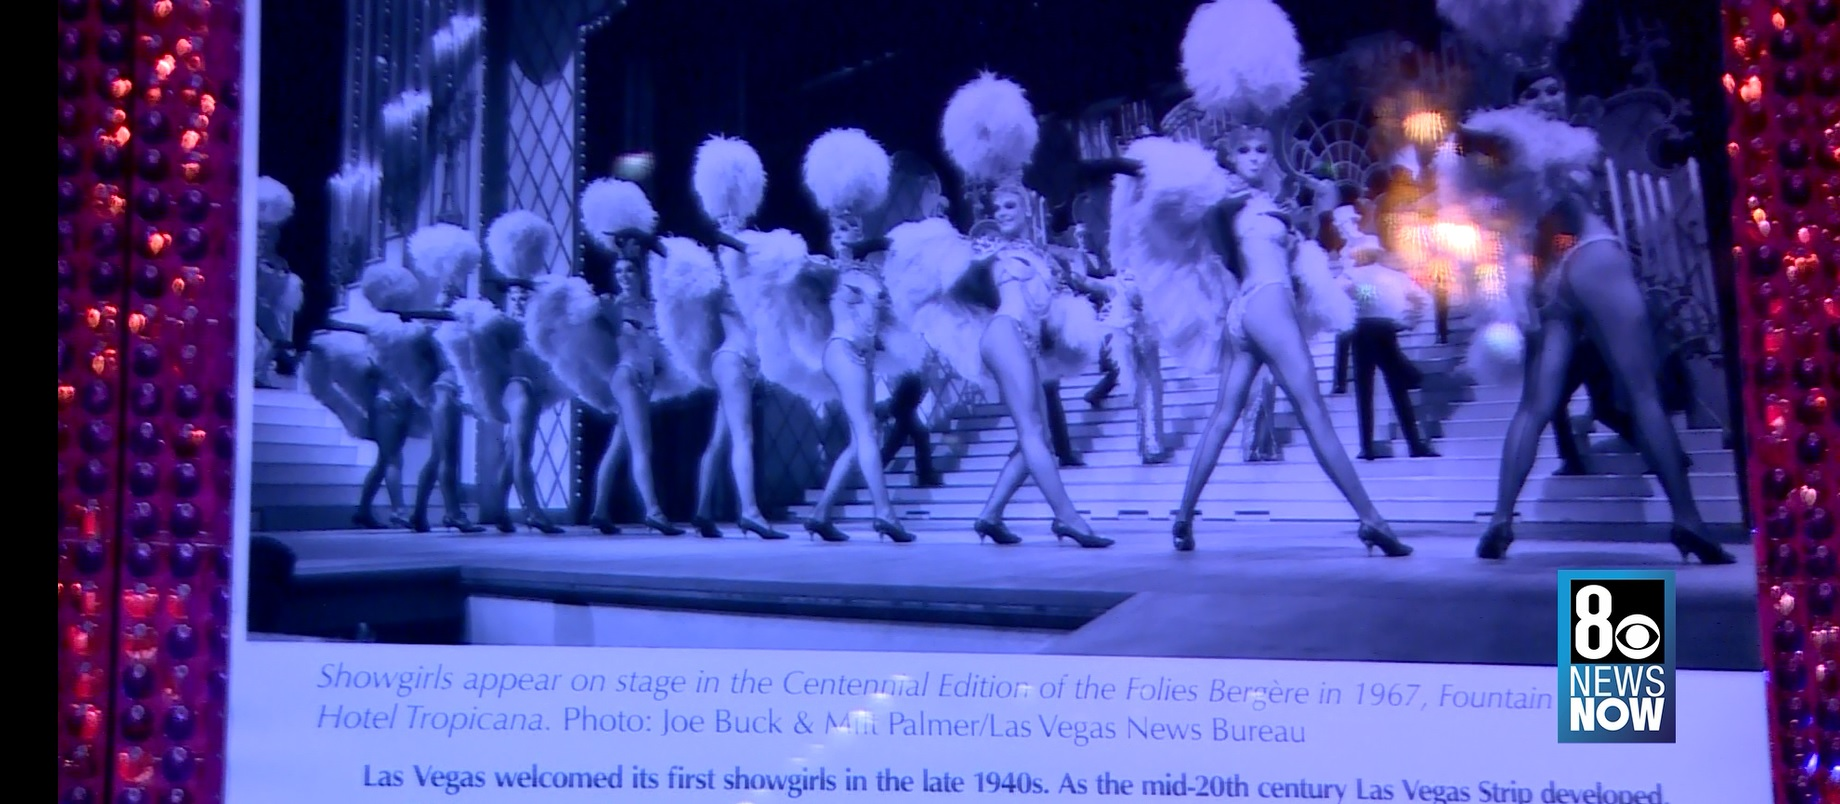 Showgirl exhibit